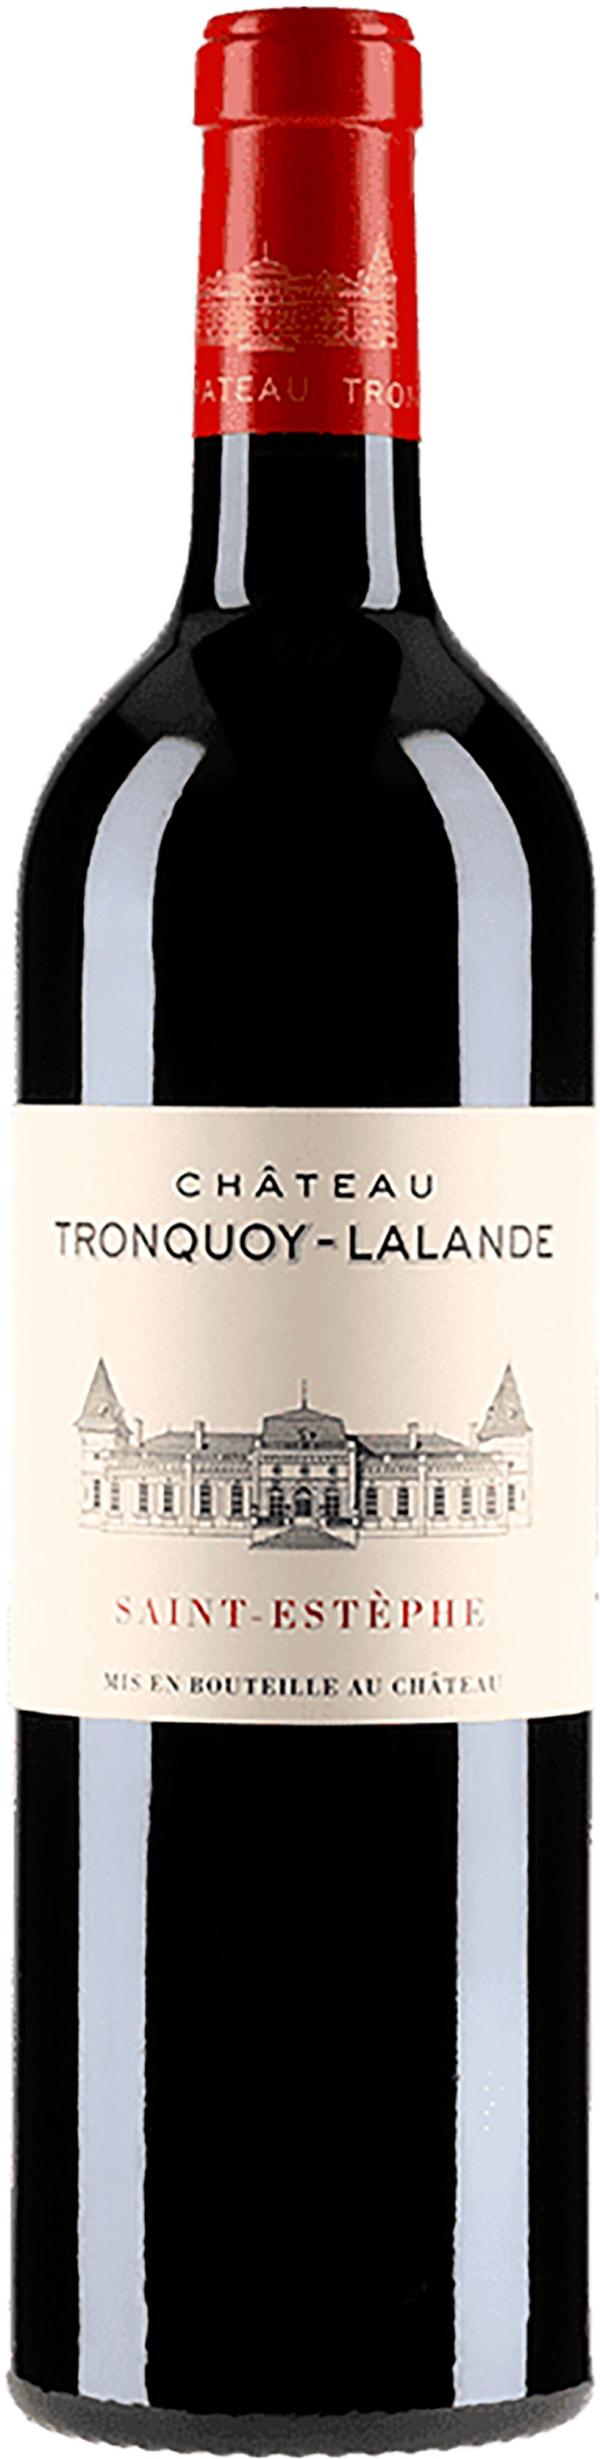 Chateau Tronquoy-Lalande 2012